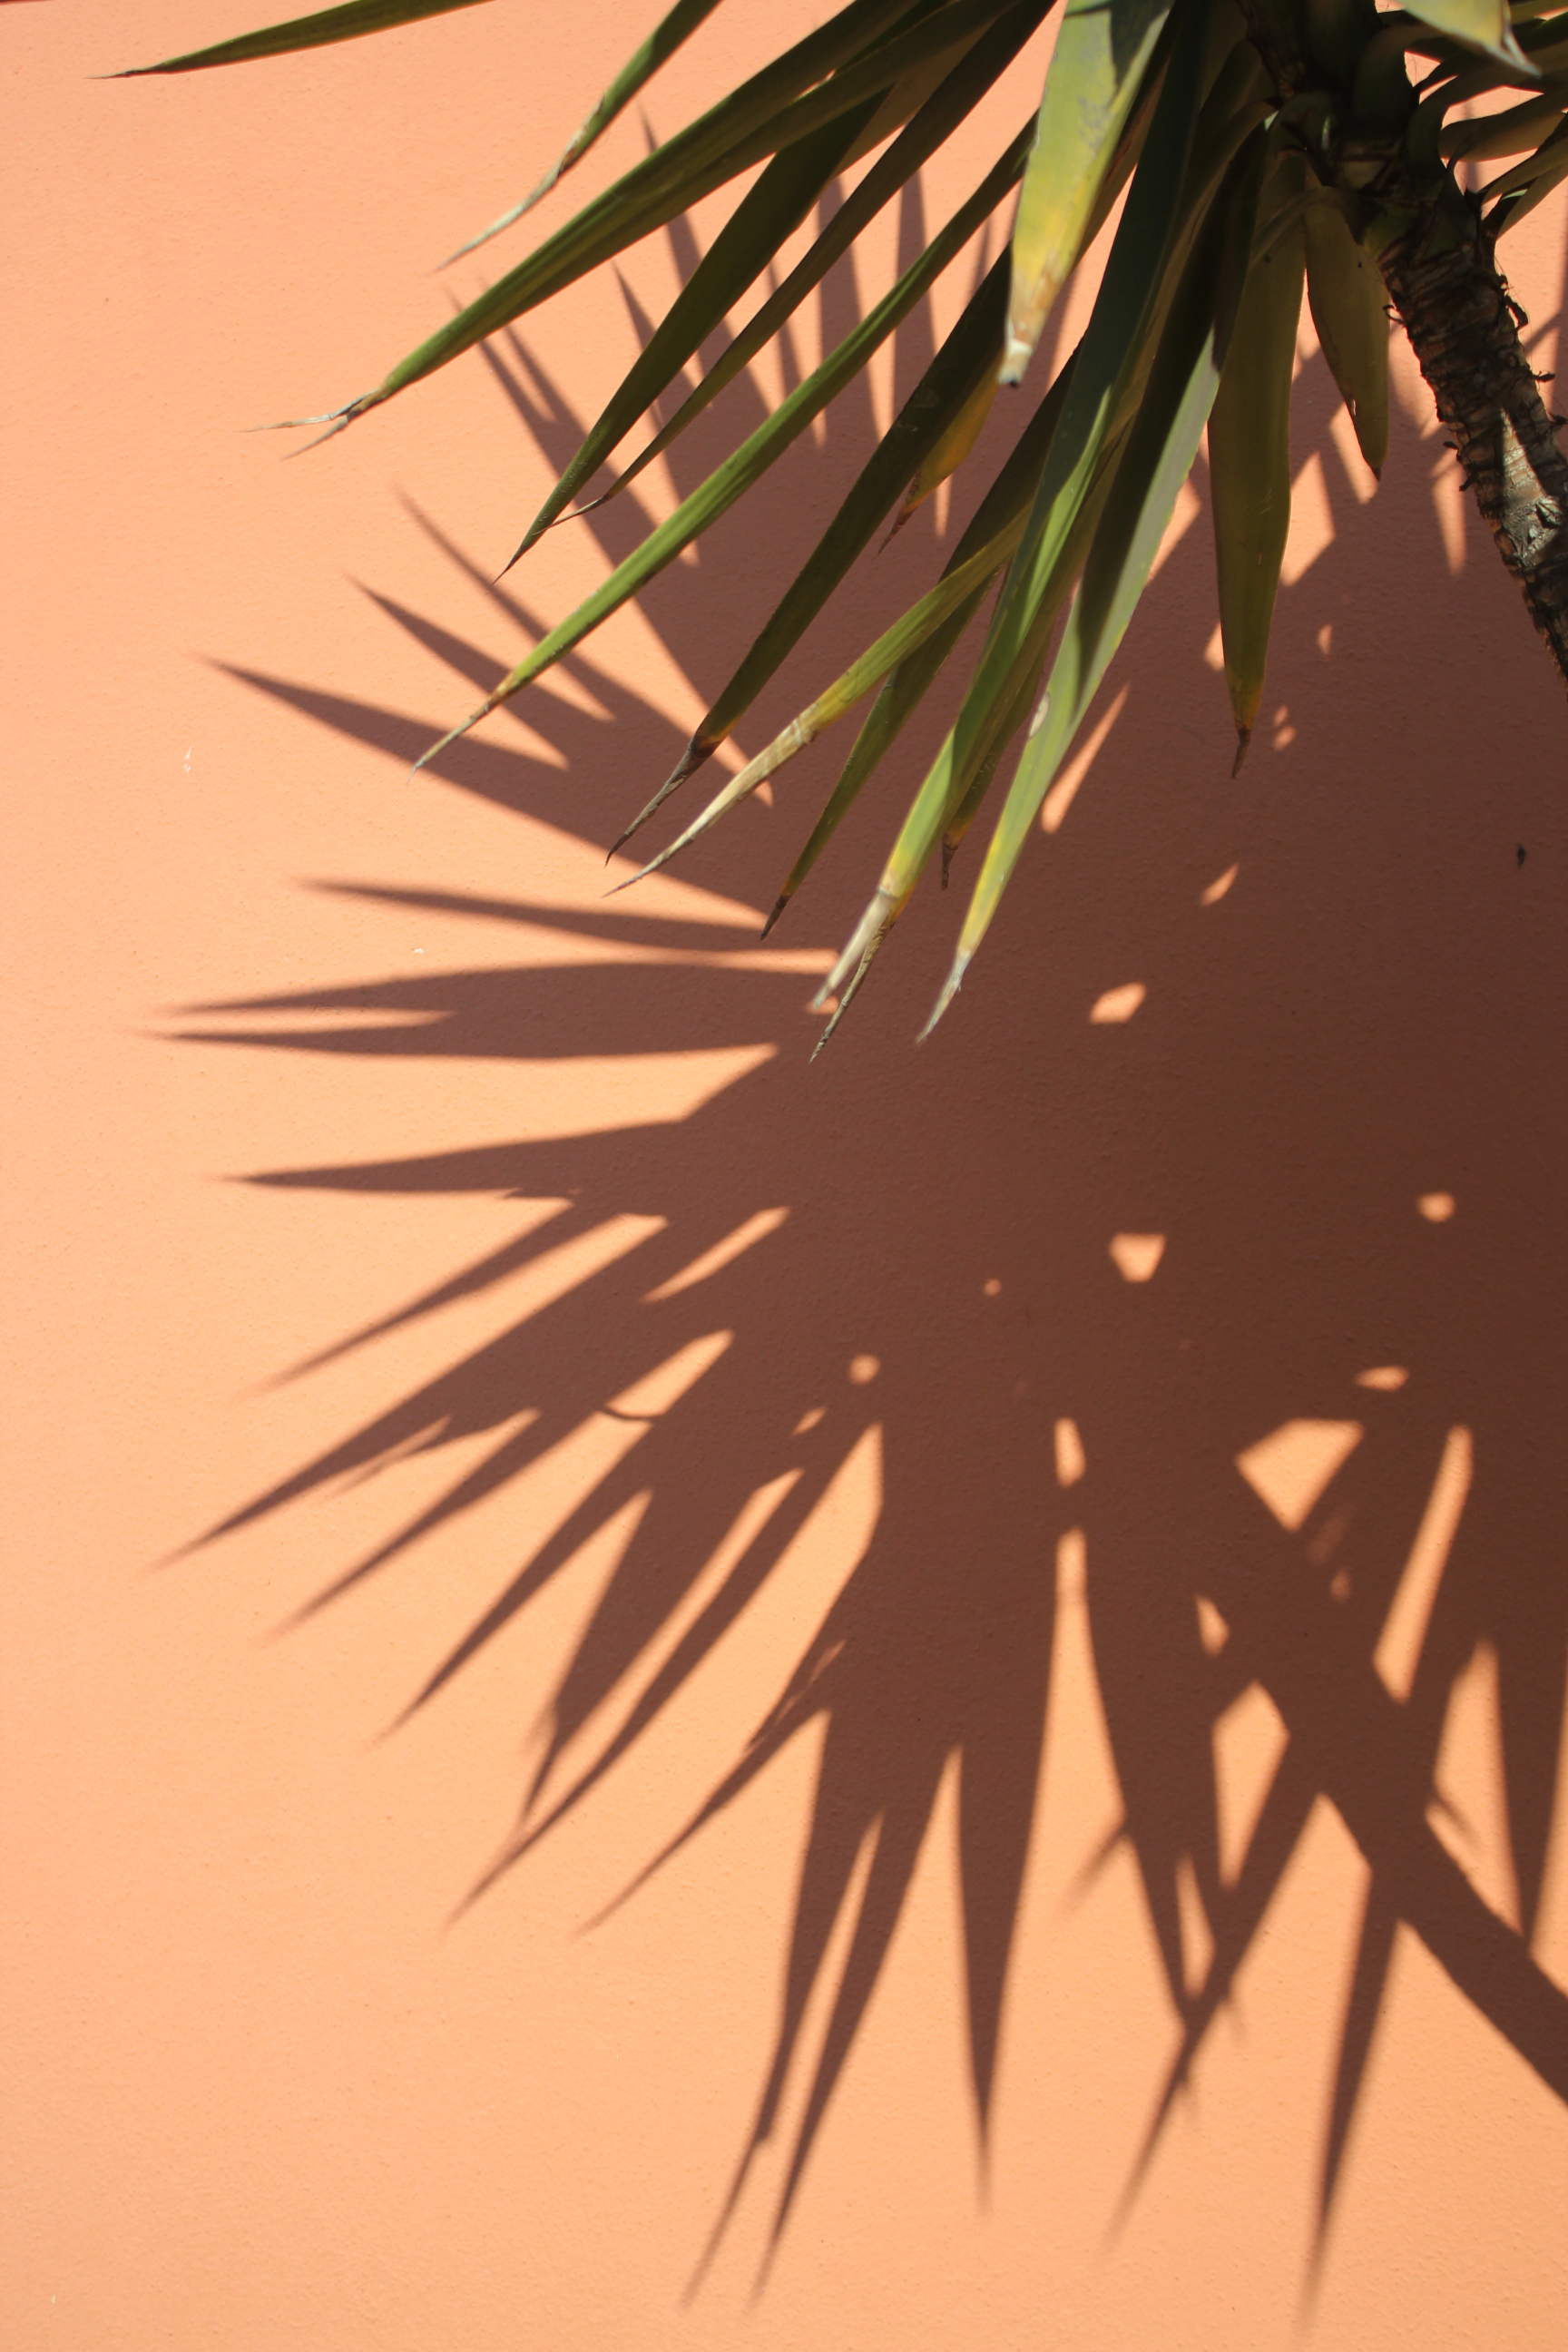 Cremona Italy Plant Leaves Sunlight Orange